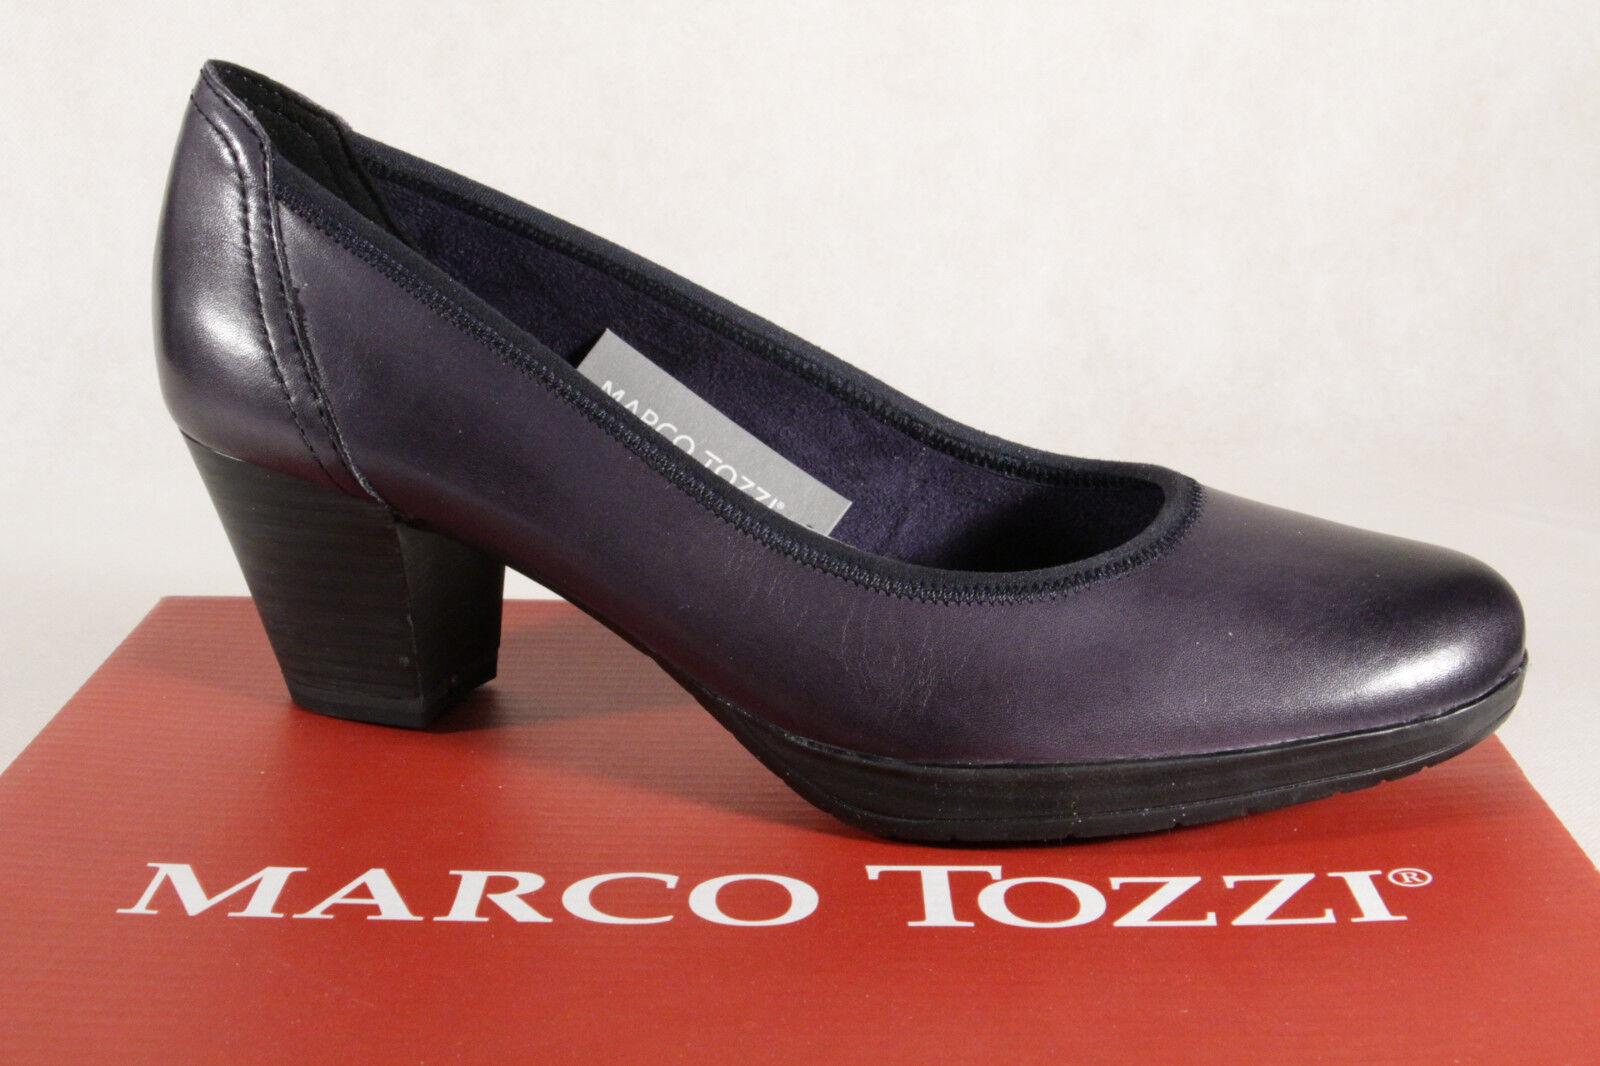 Marco Tozzi 22420 Escarpins Mocassins Bleu Antishokk Neuf